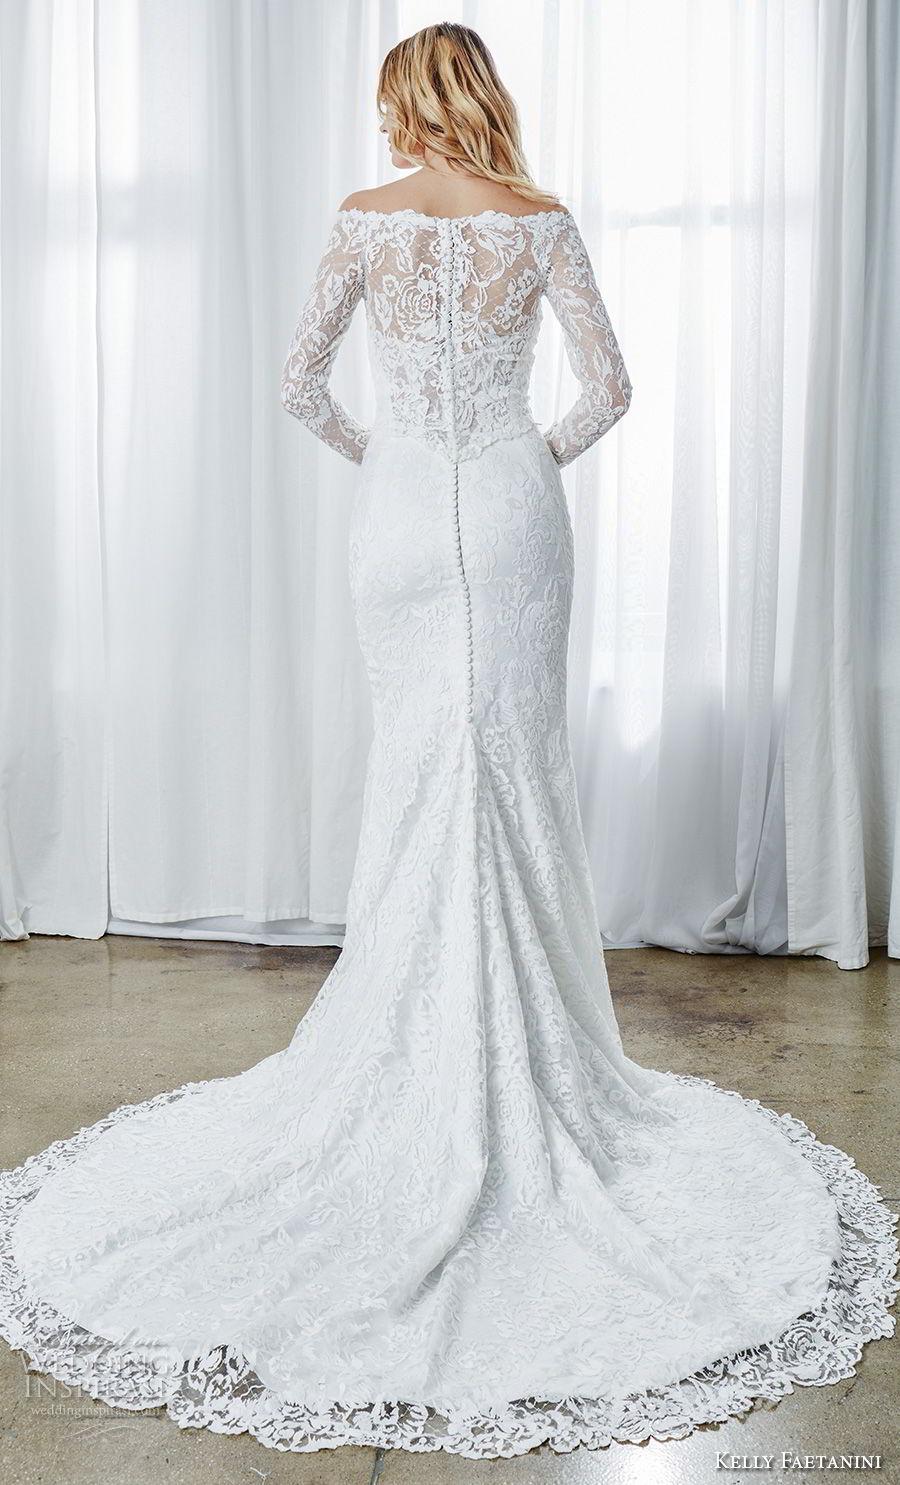 Kelly Faetanini Spring 2019 Wedding Dresses Wedding